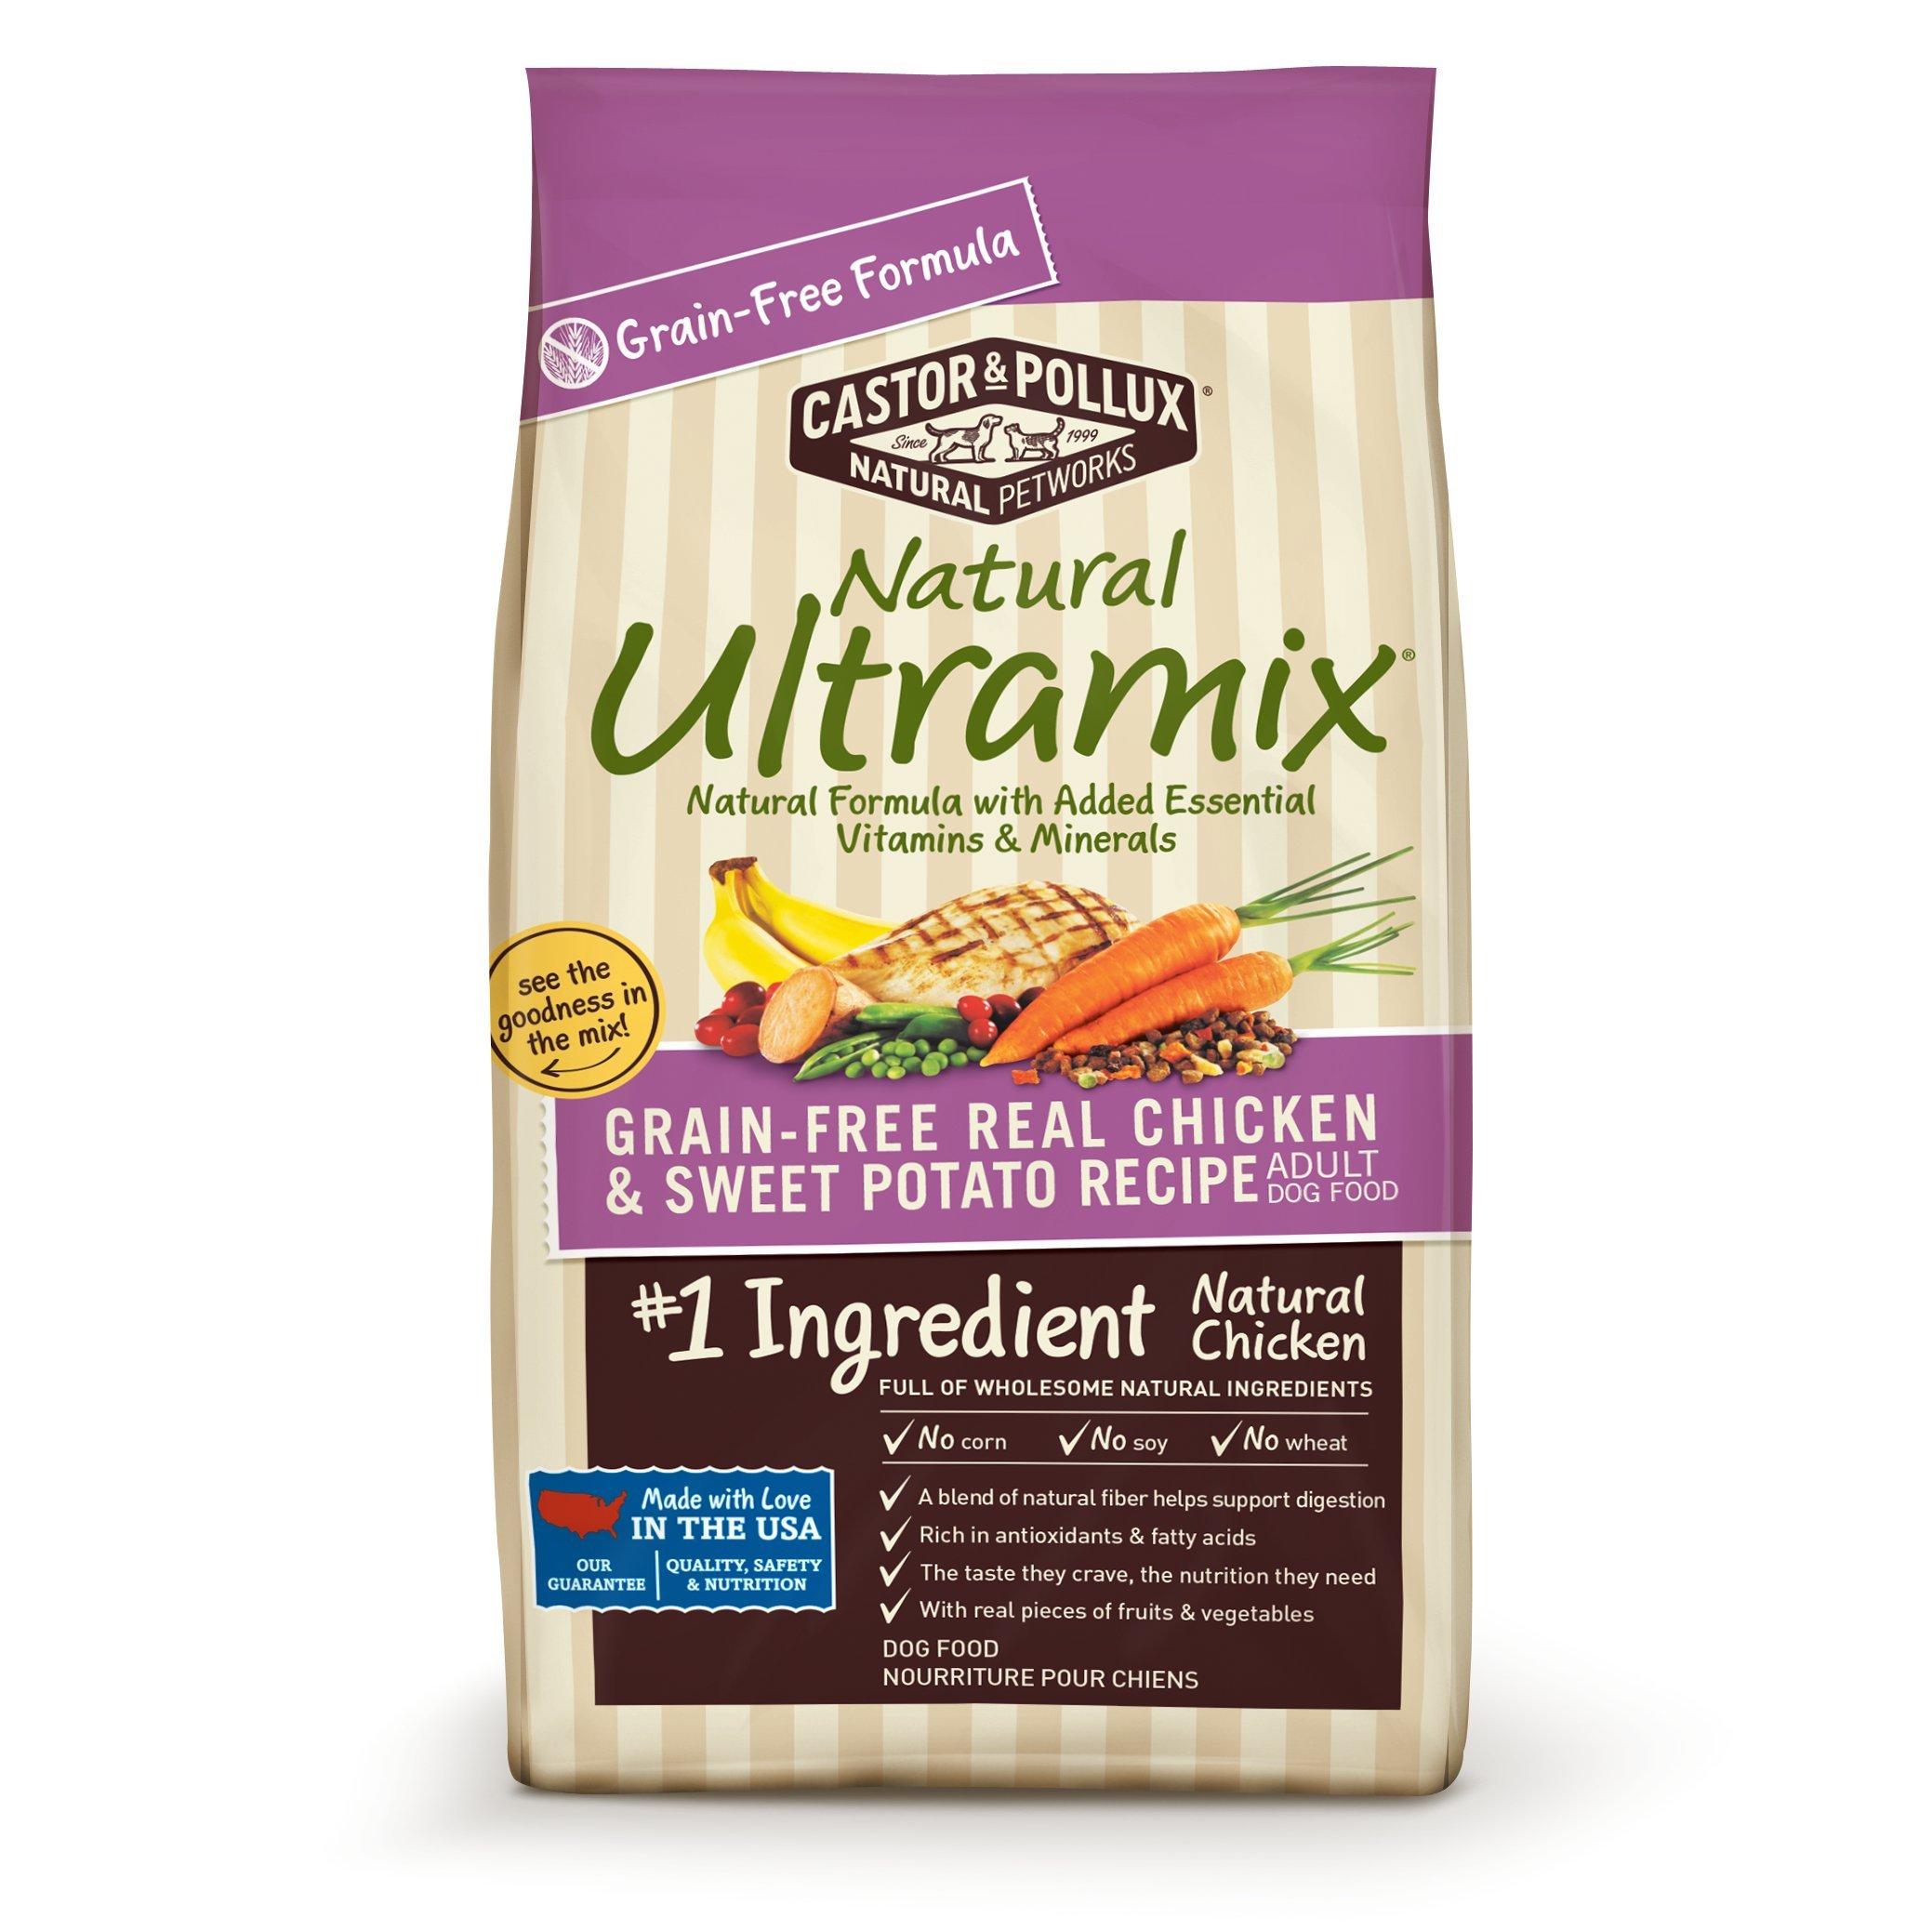 Natural Ultramix Grain Free Chicken & Sweet Potato Food, 25 lb